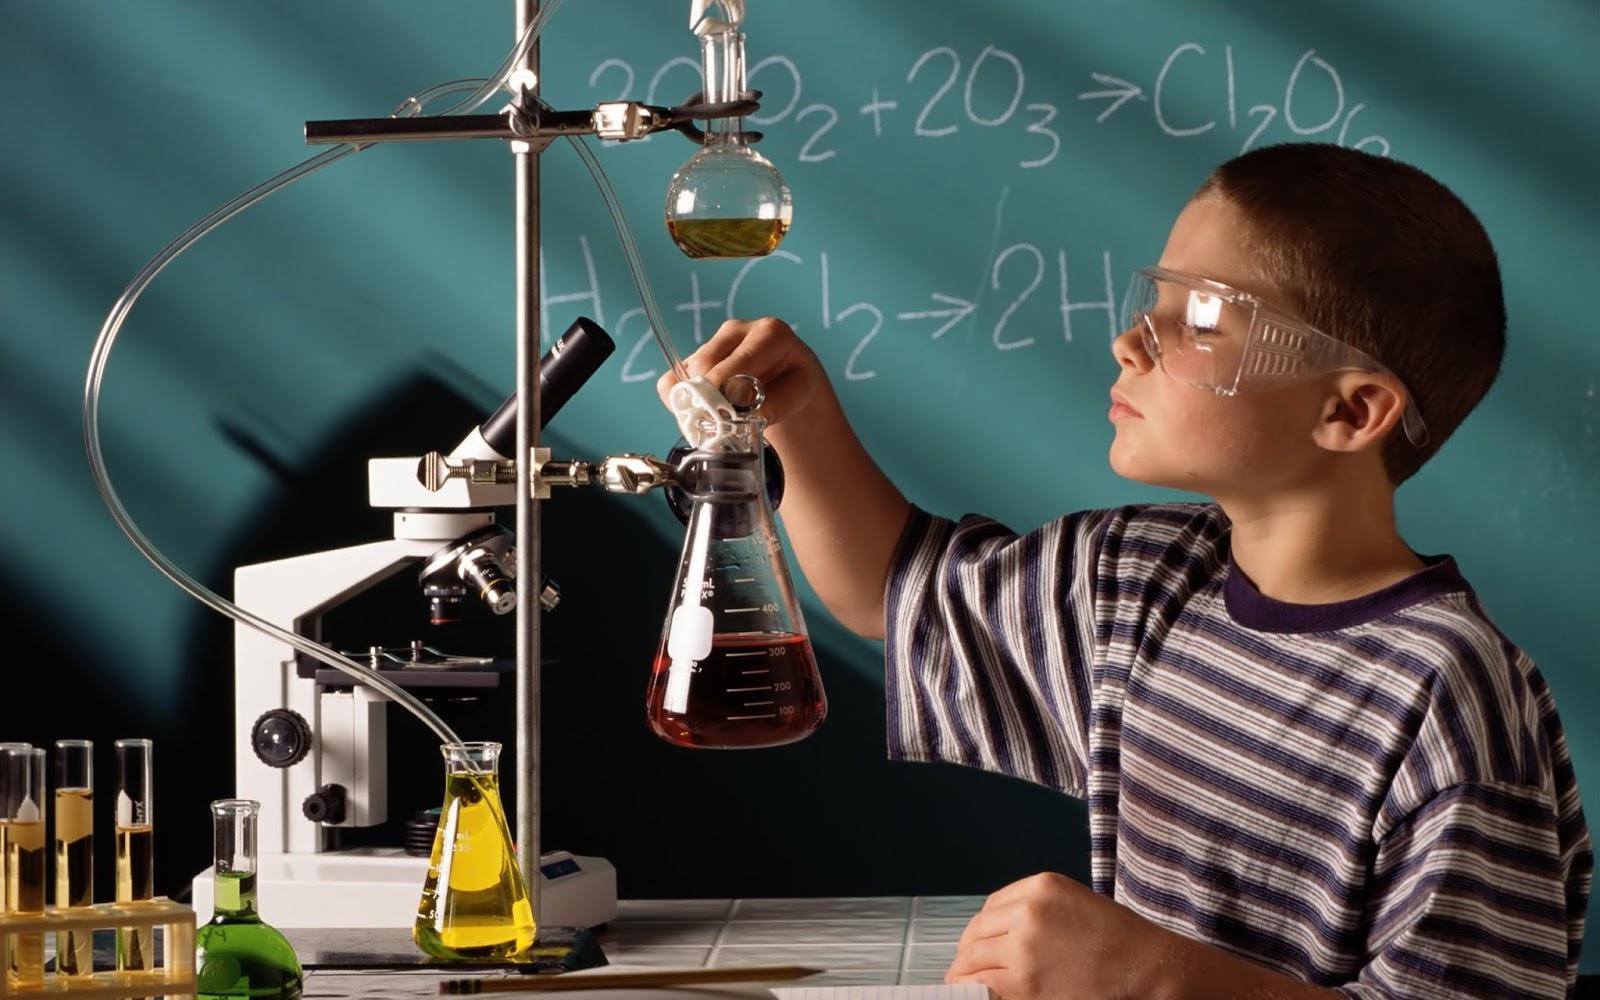 महत्वपूर्ण रासायनिक सूत्र